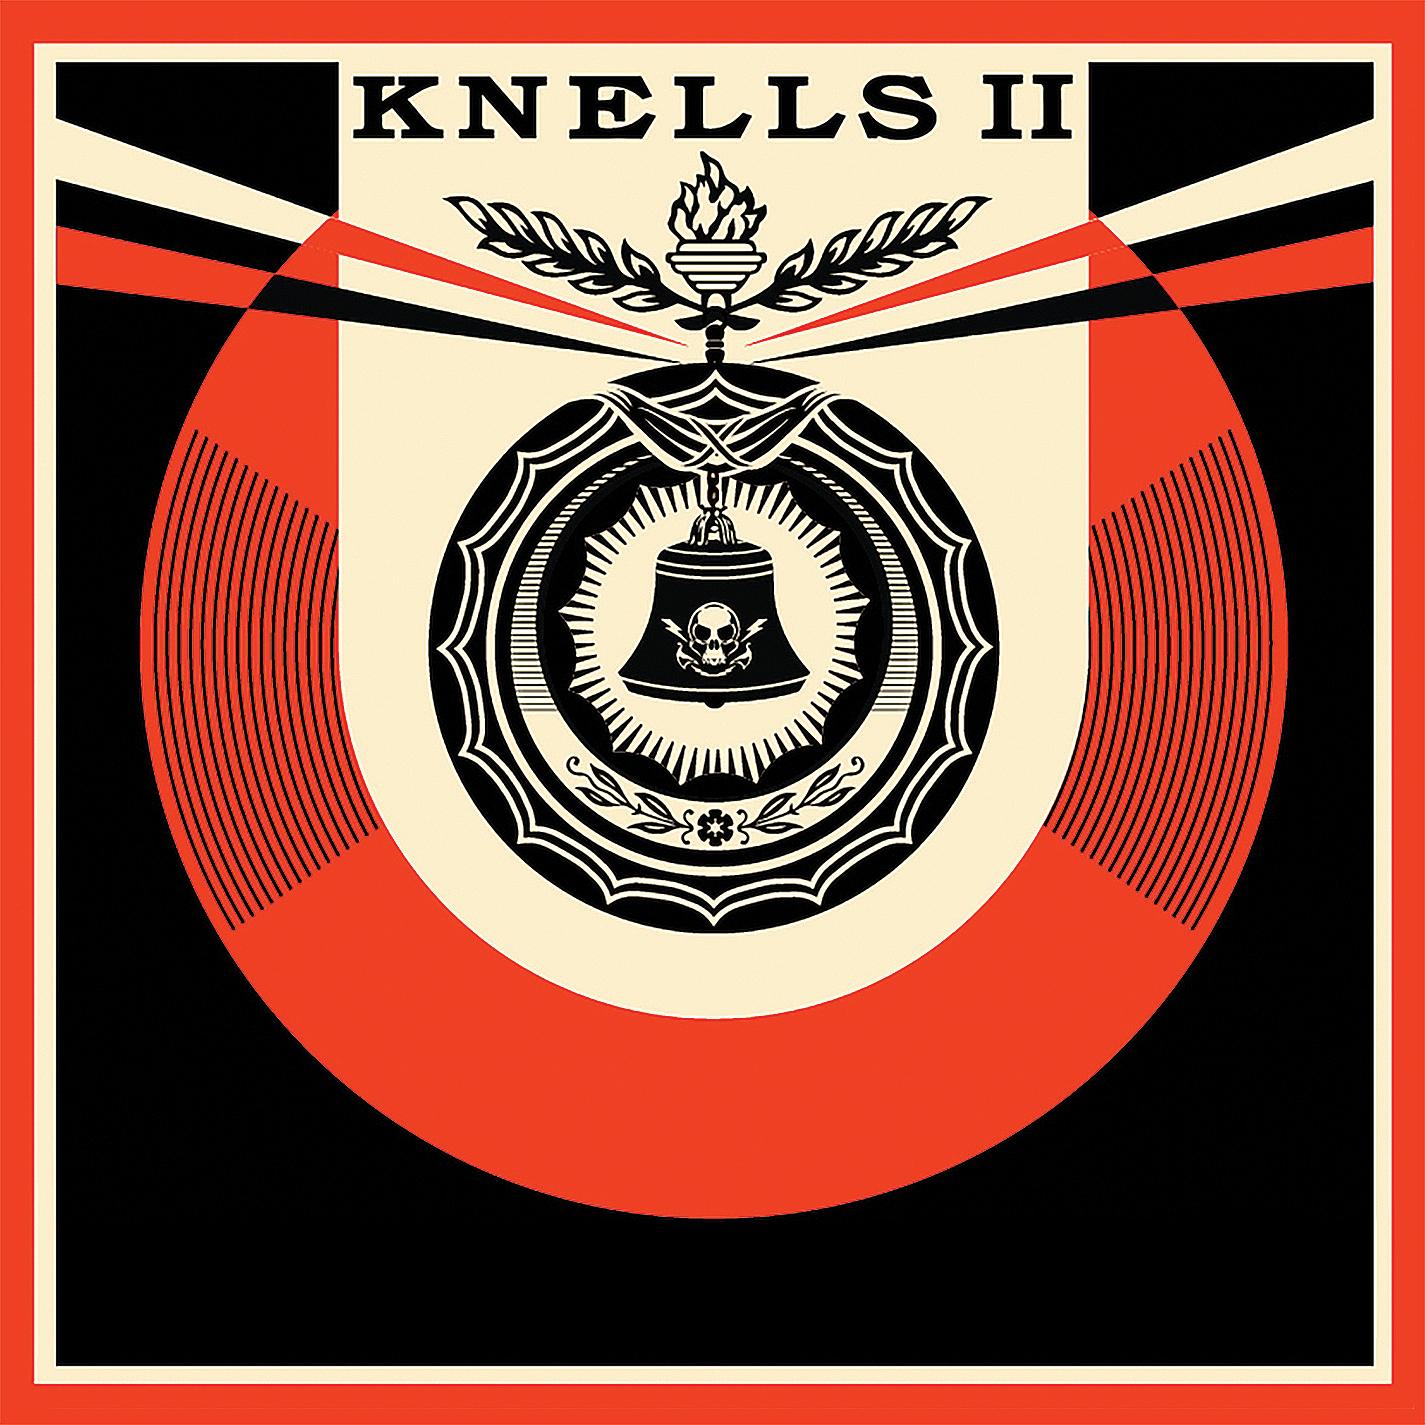 T he Knells:  KNELLS II  (2017) composer, musician, producer, engineer